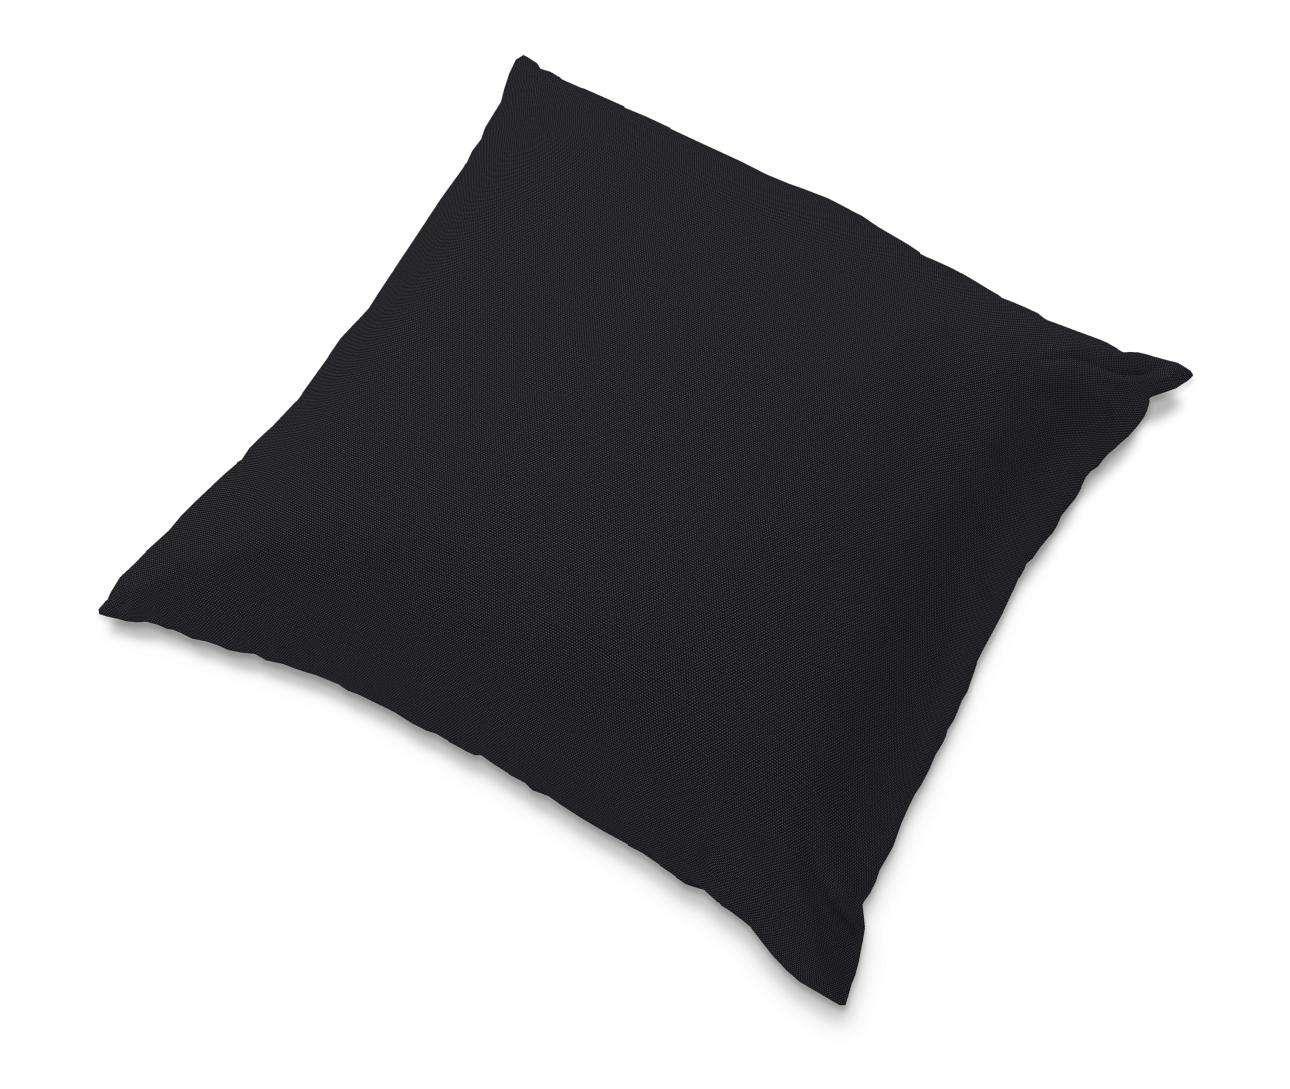 Poszewka Tomelilla 55x55cm w kolekcji Etna, tkanina: 705-00